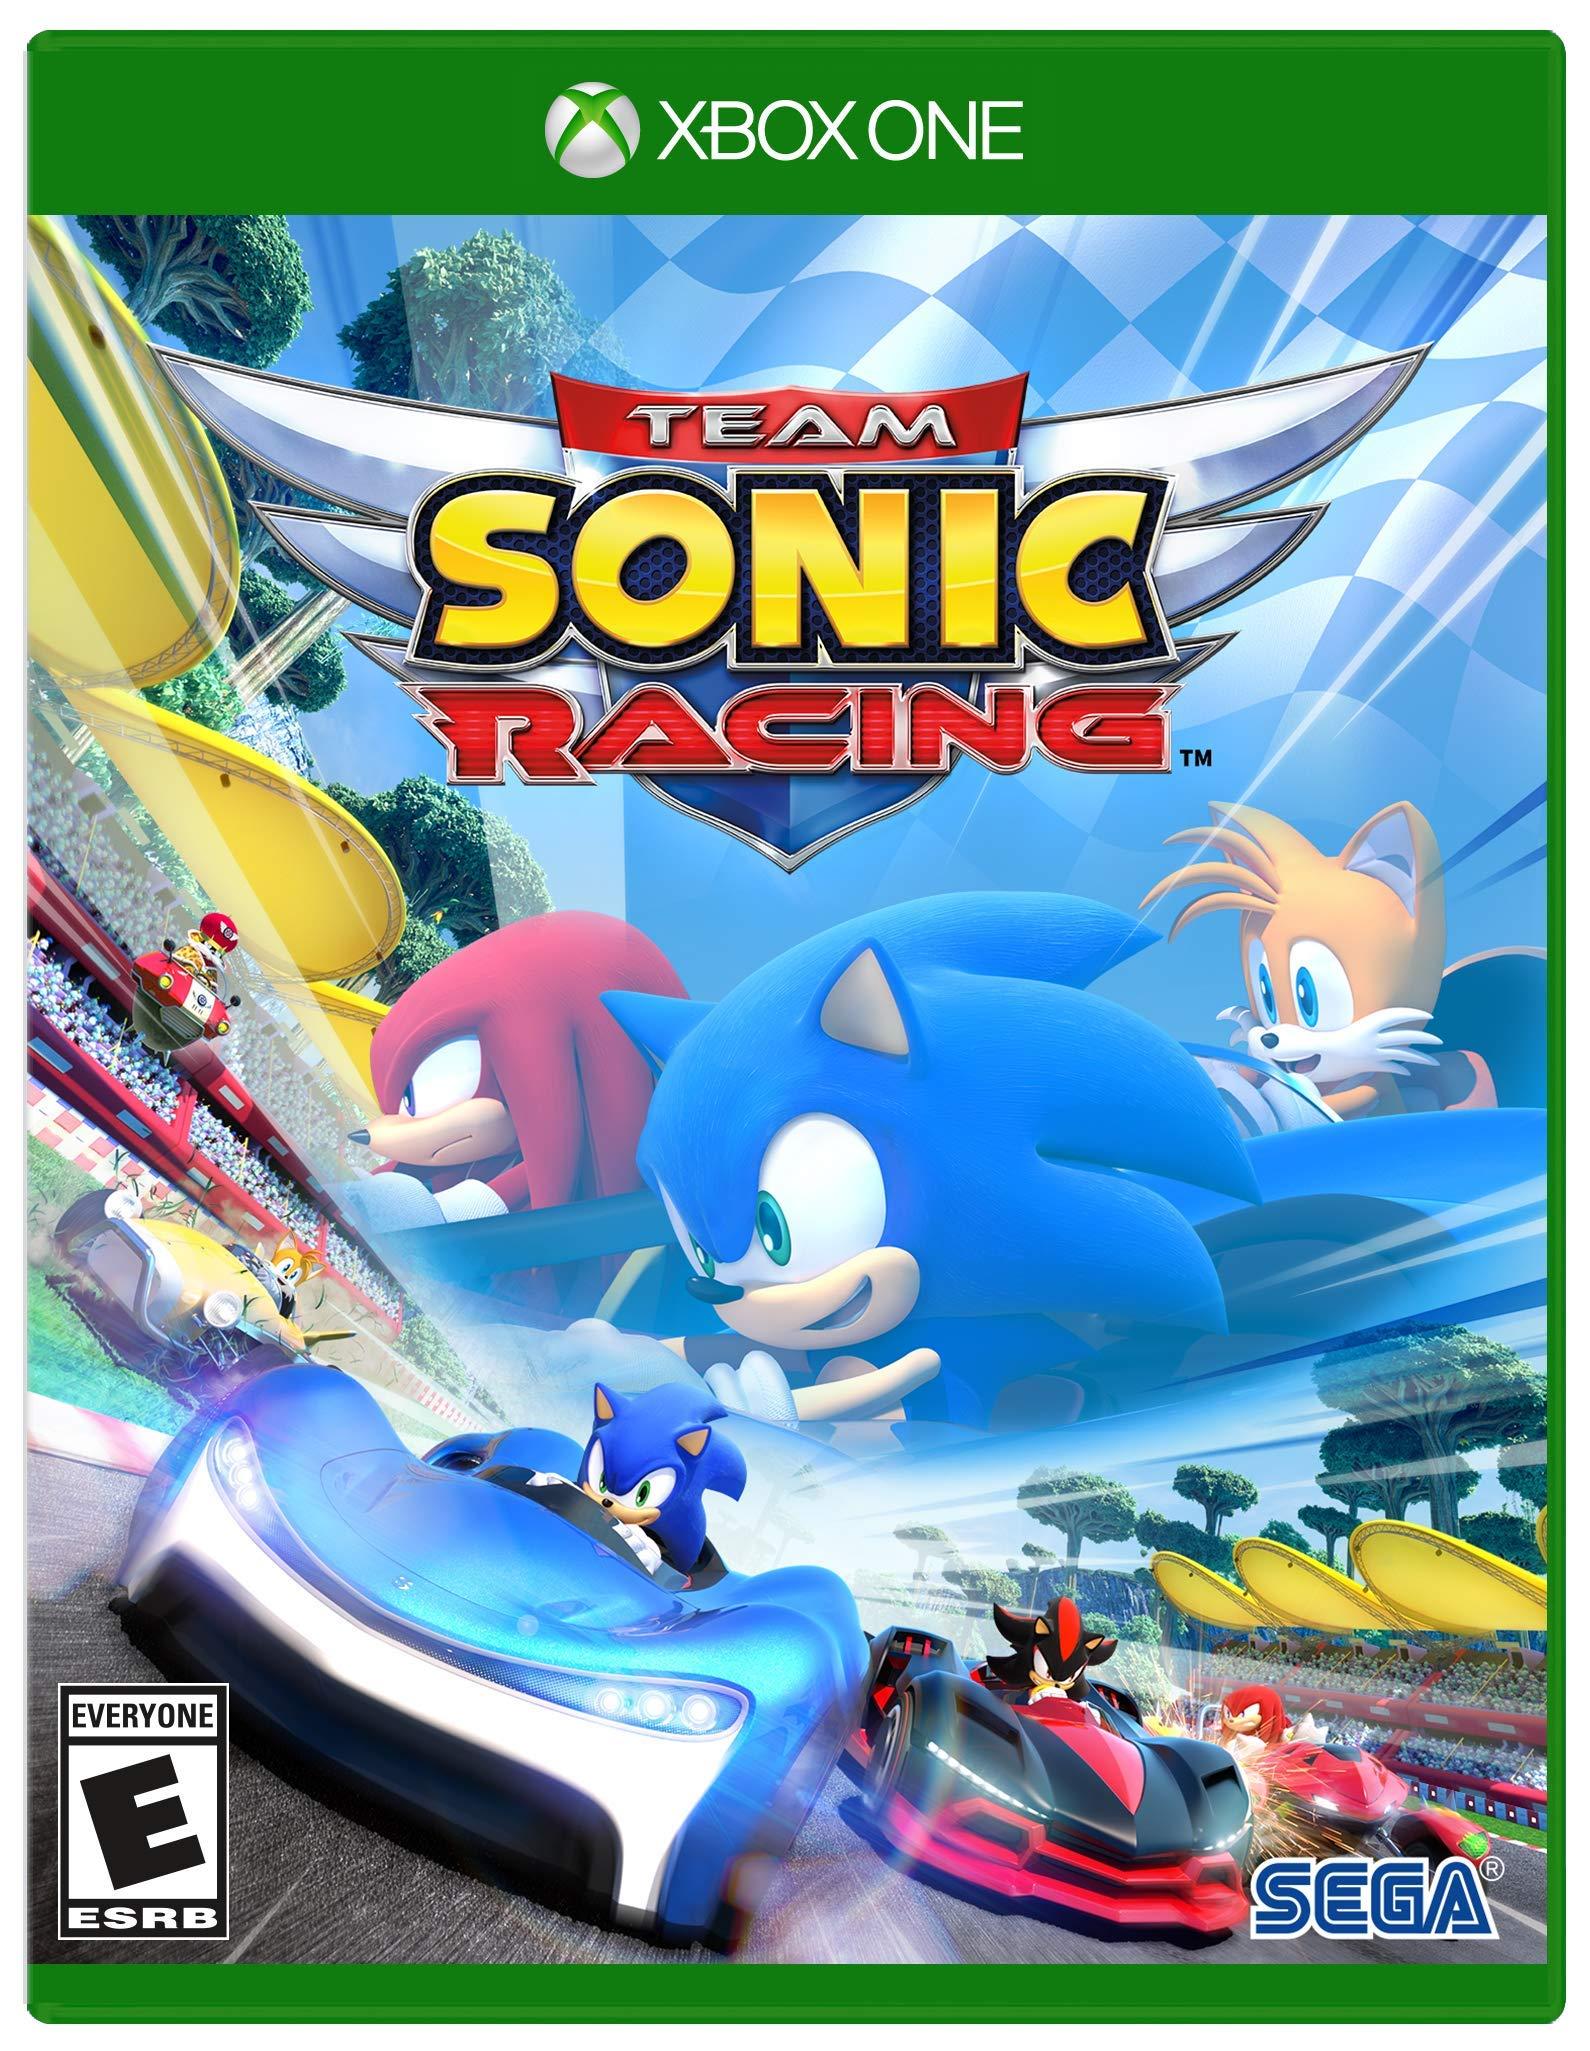 Team Sonic Racing - Xbox One by Sega (Image #5)